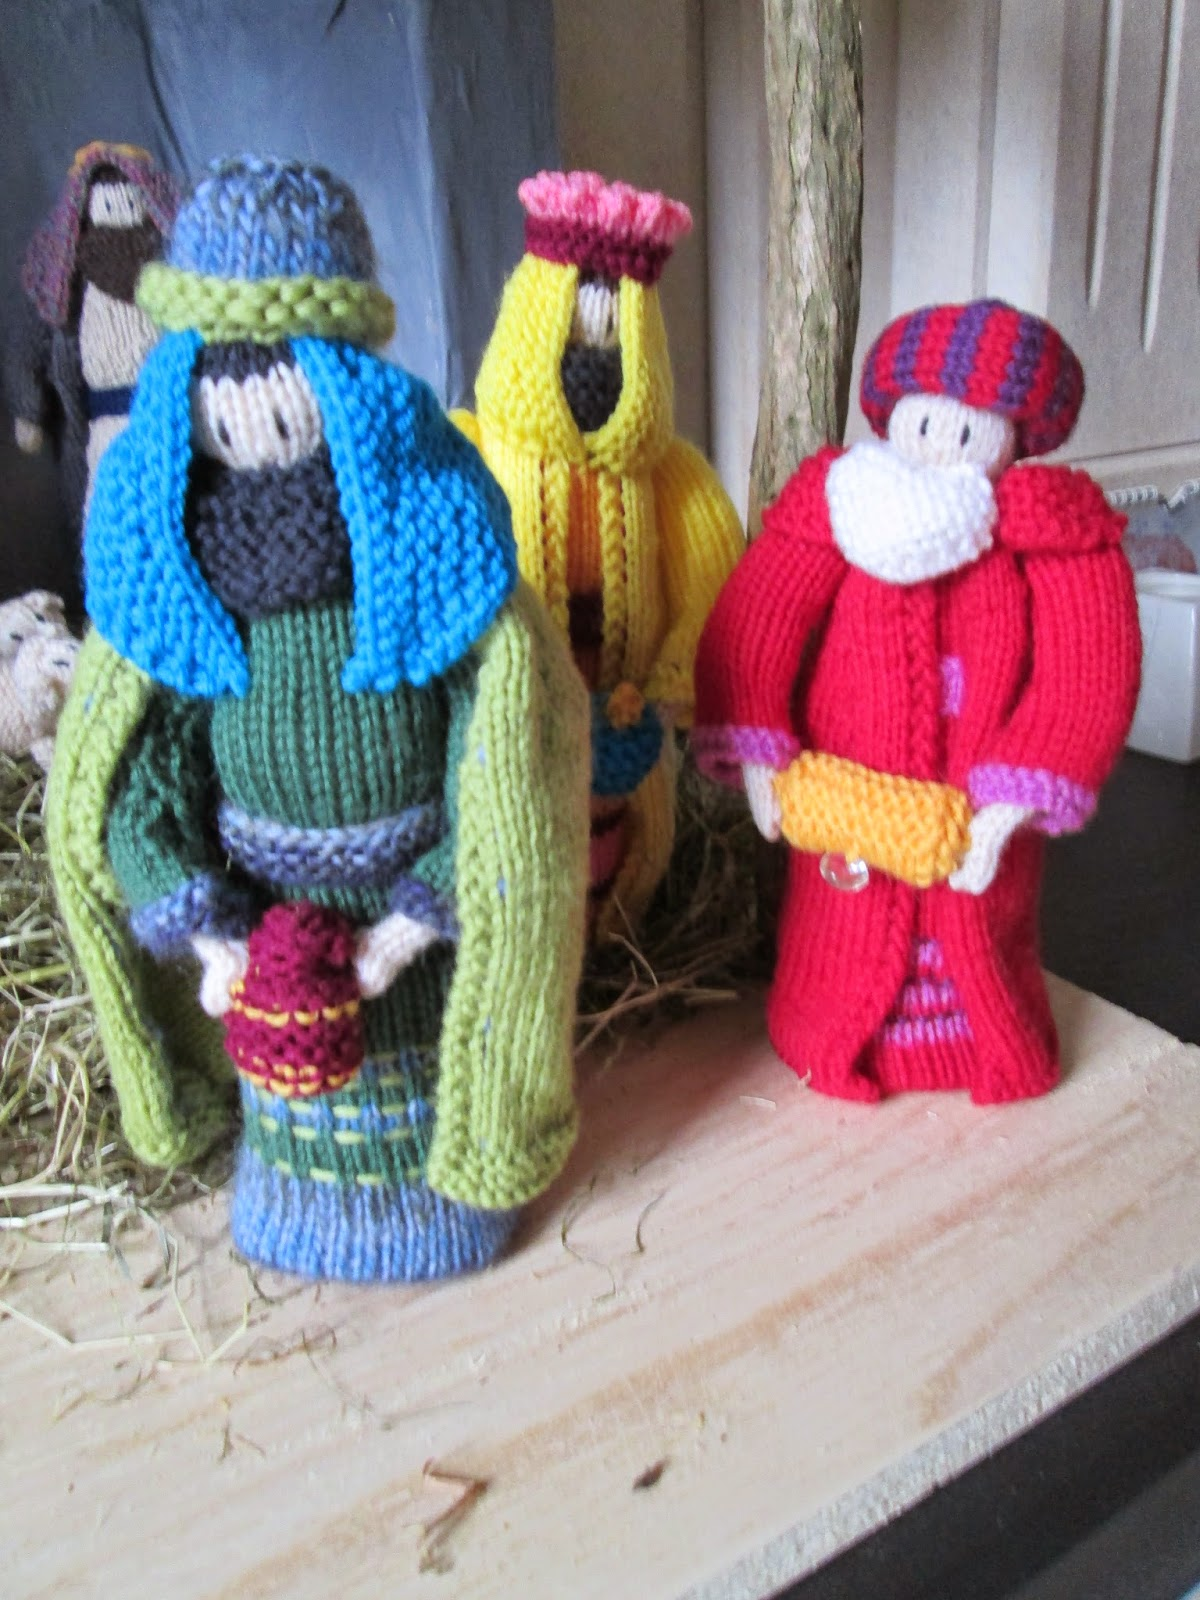 Knitting Pattern Nativity Stable : hookin A yarn: Knitted Nativity Set